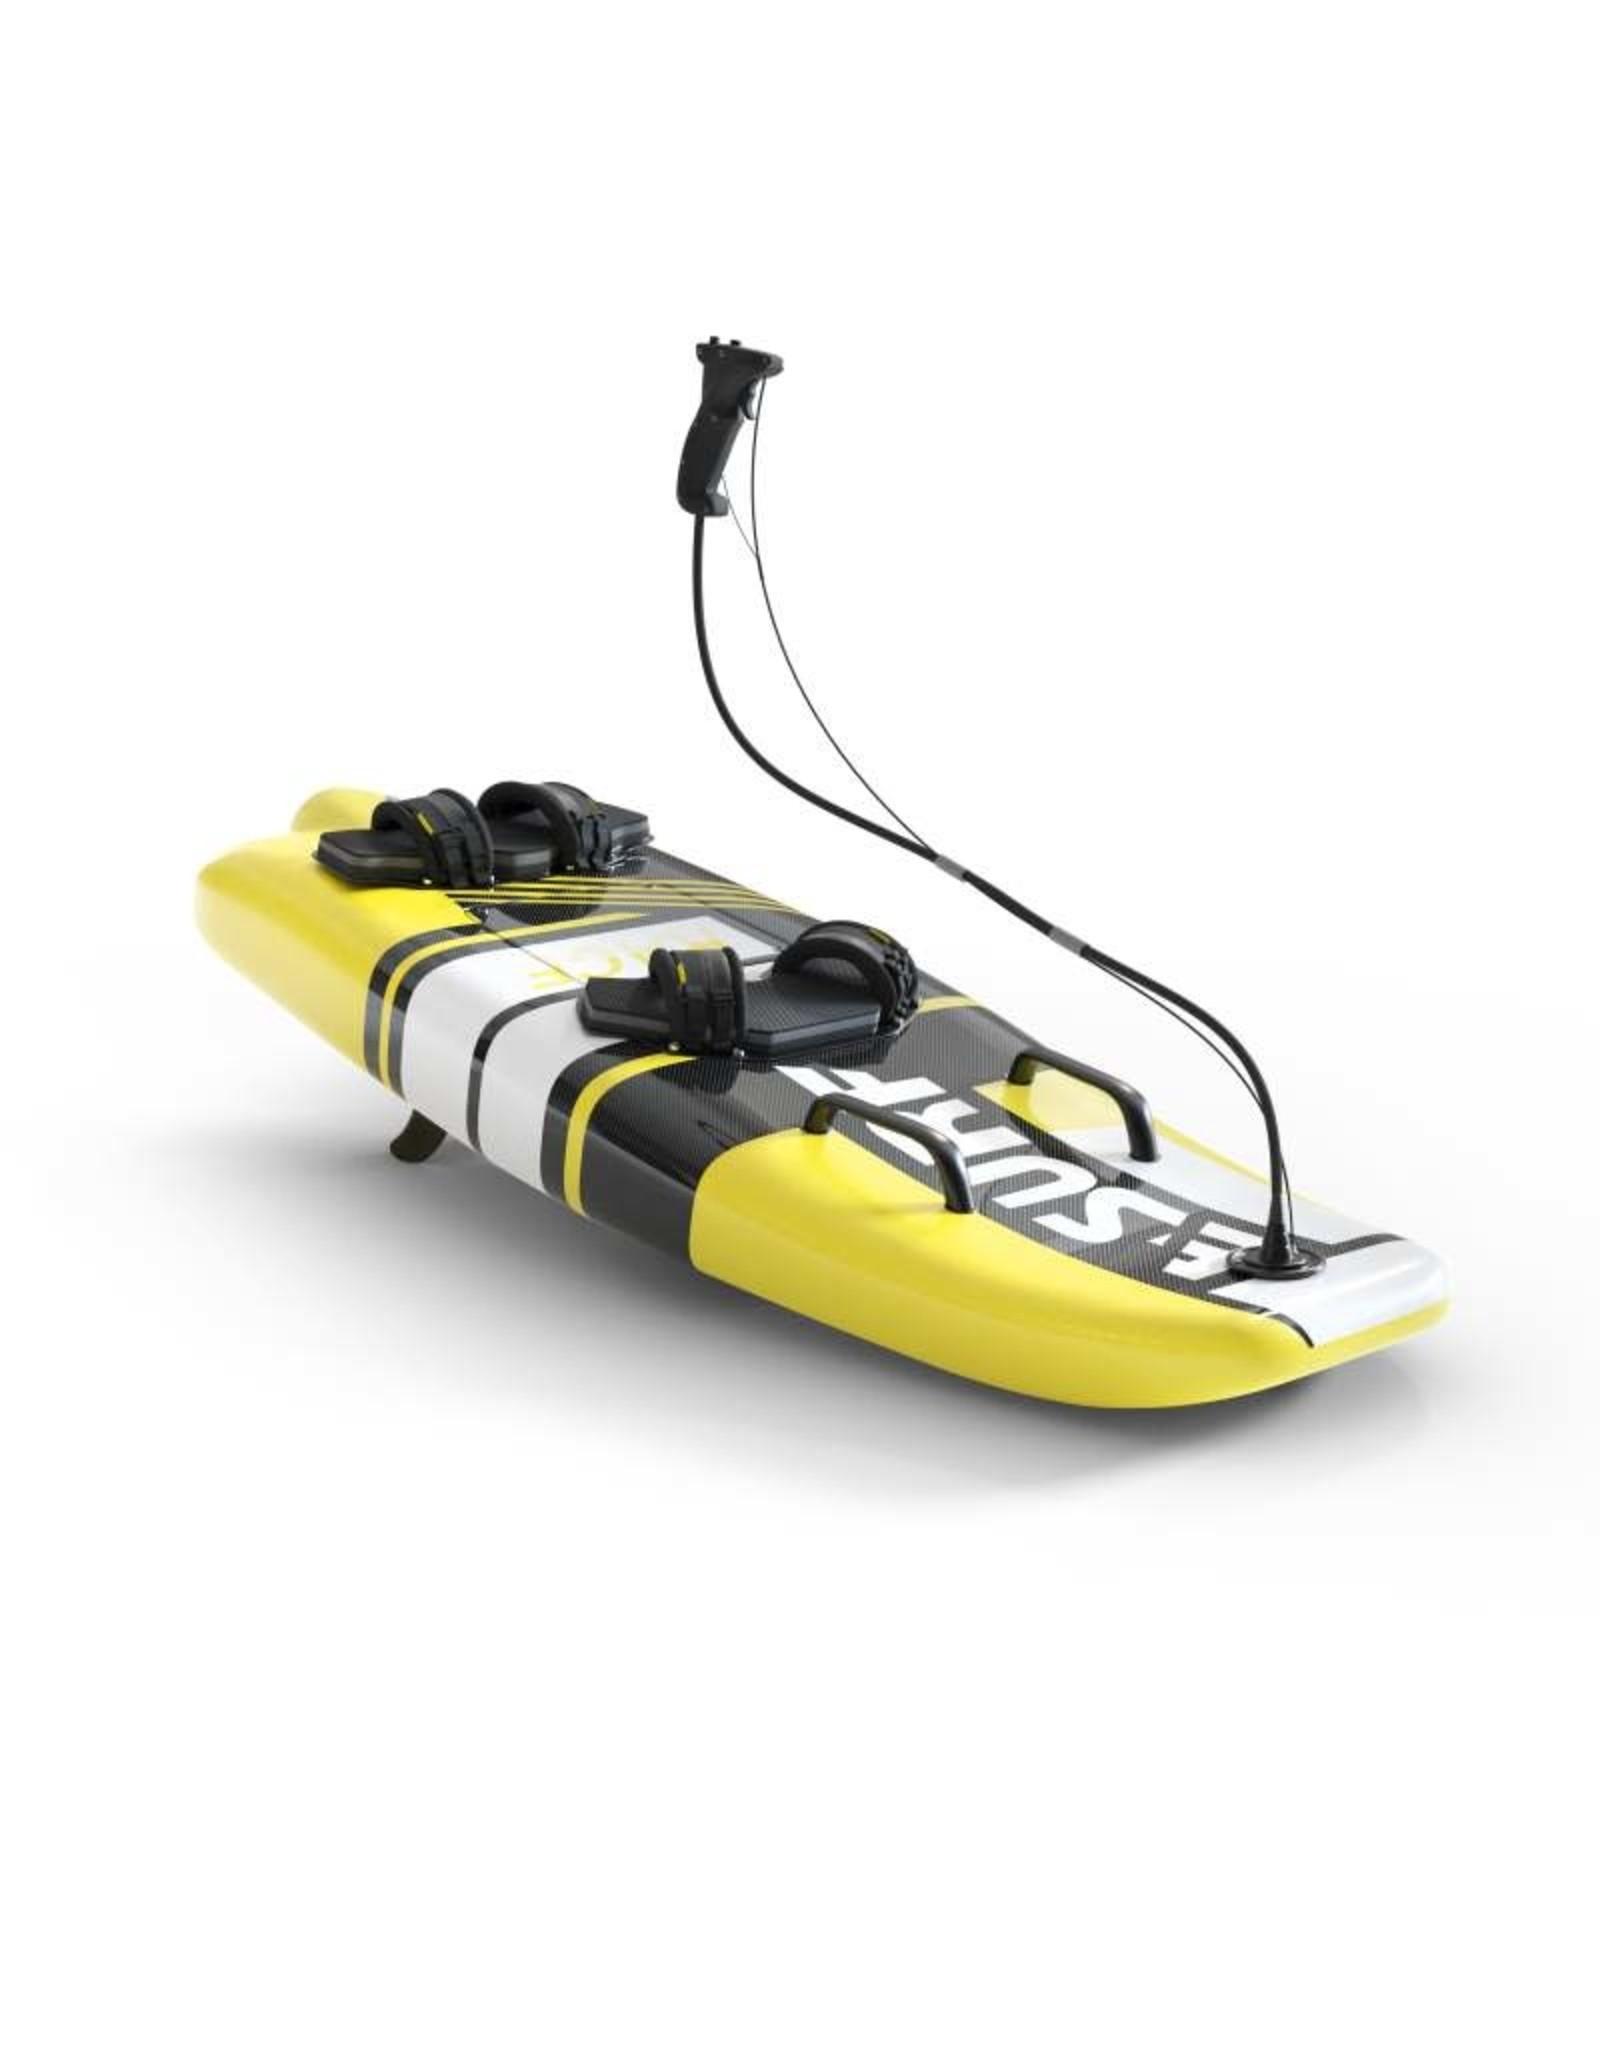 E-Surf E-surf Race electric surfboard yellow